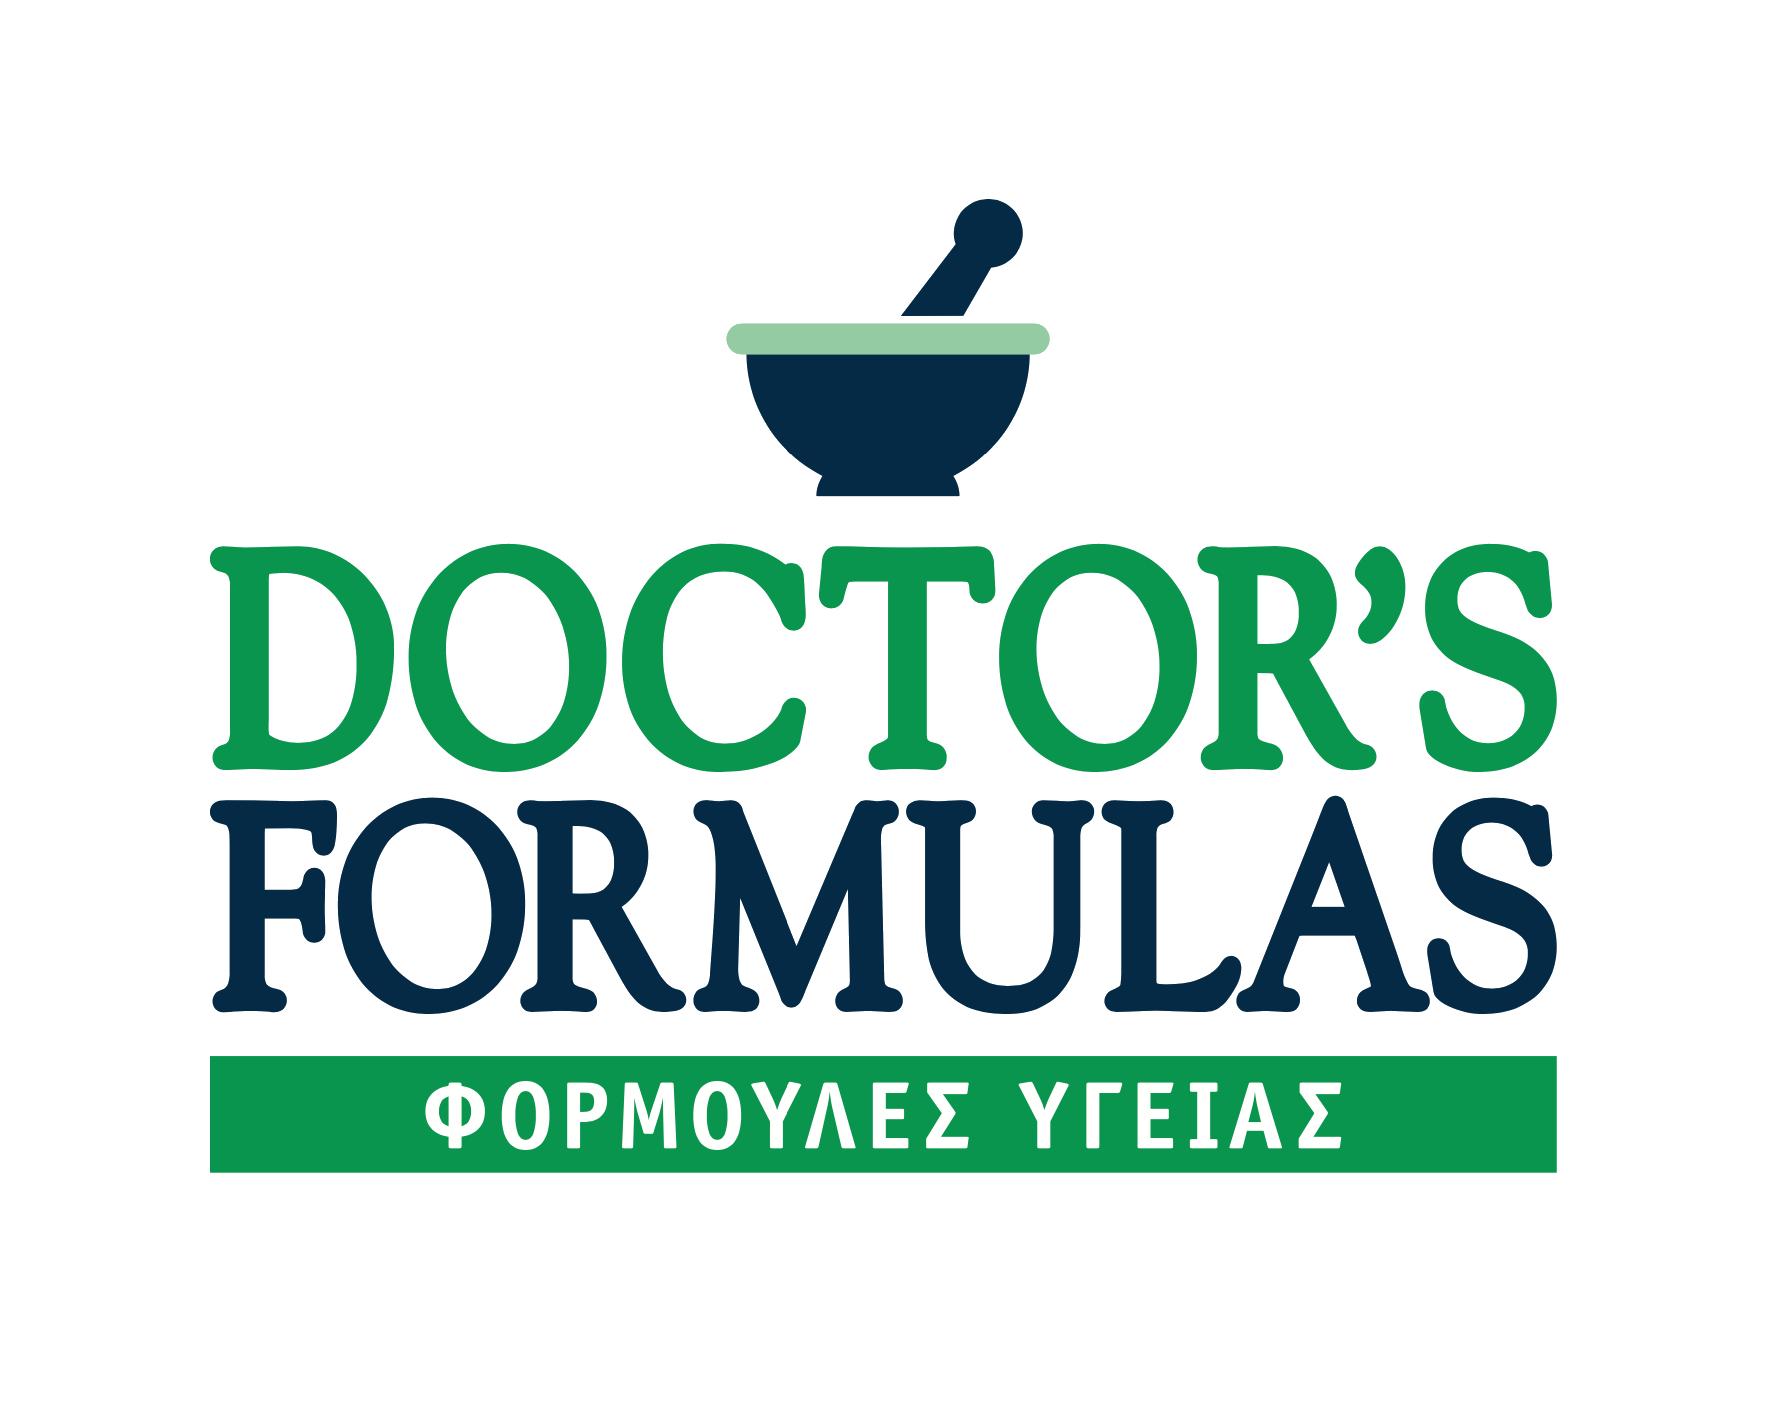 Doctor's Formulas